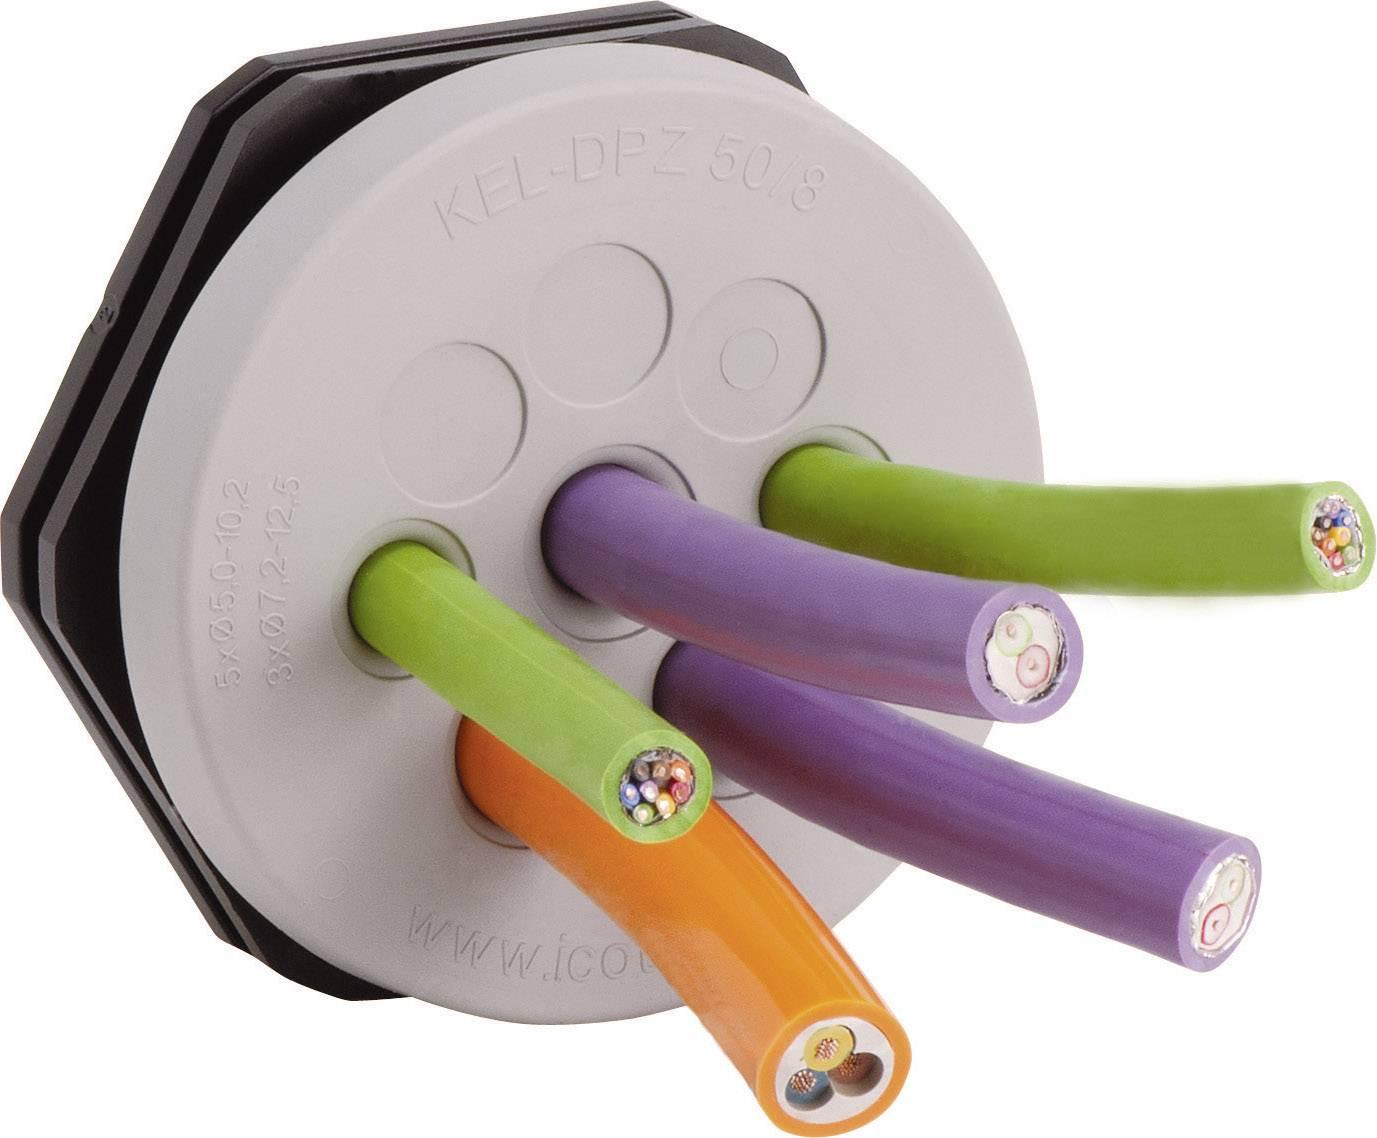 Icotek Uvodnica za kable KEL-DPZ okrogla KEL-DPZ 63|9 velikost: M63 poliamid/elastomer, siva